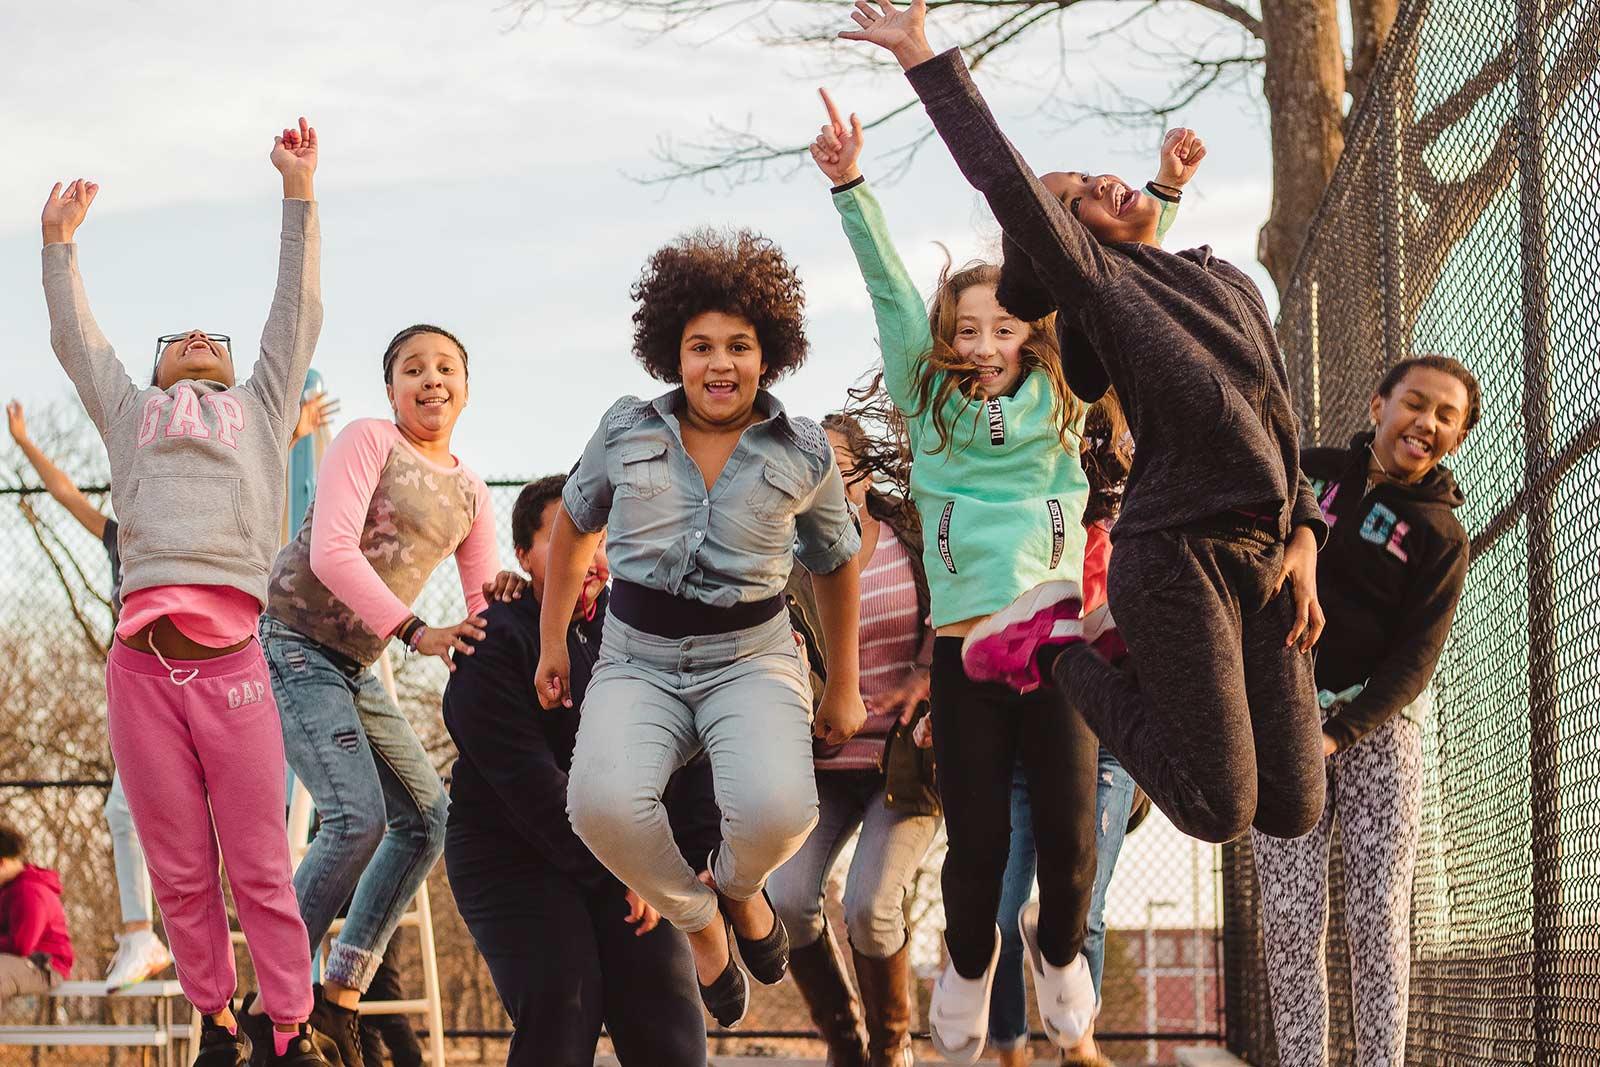 teens at Boys & Girls Club of Pawtucket